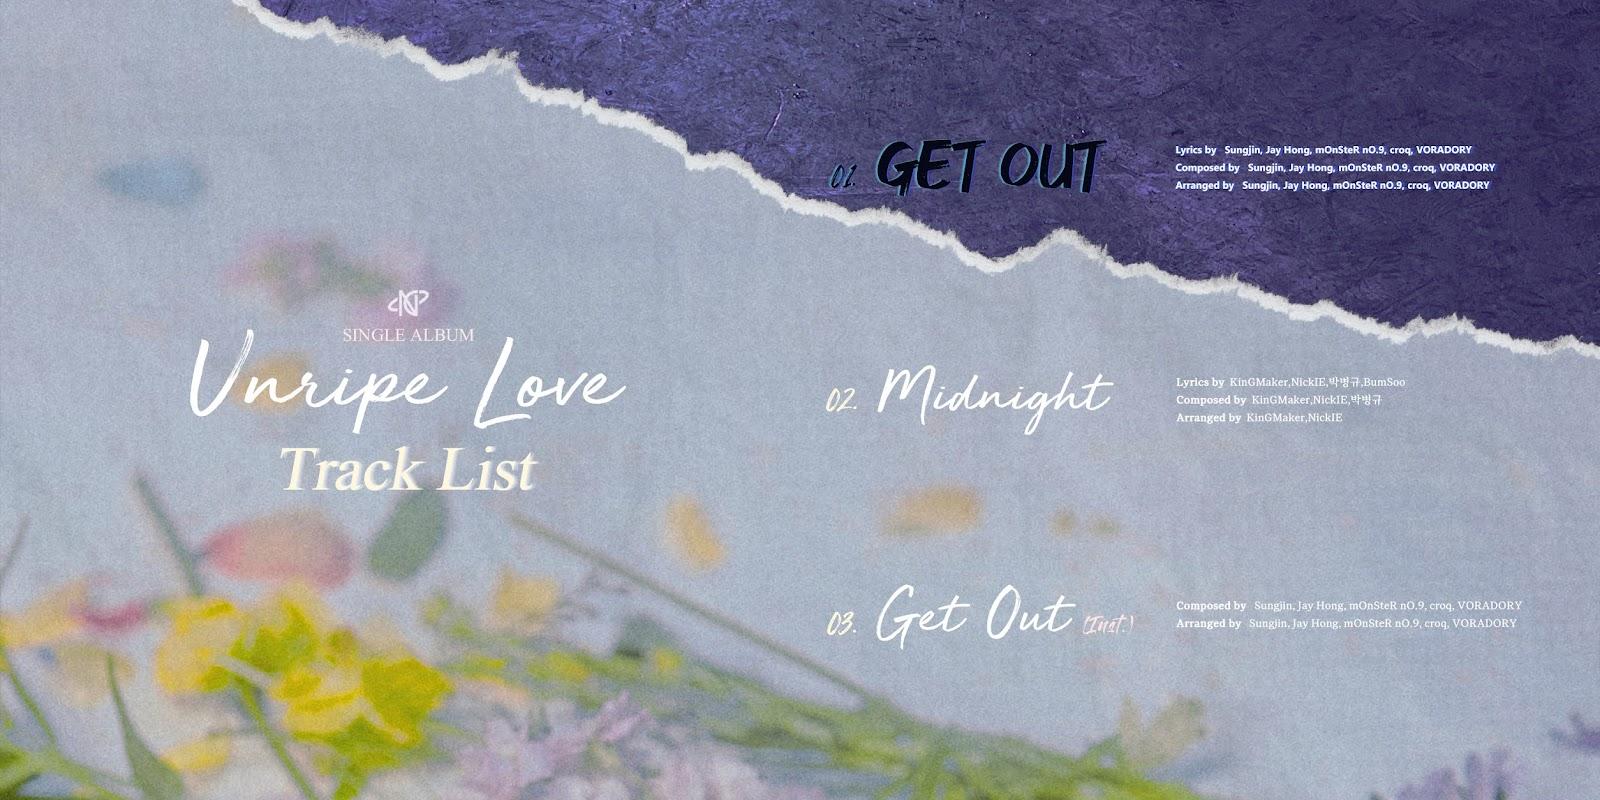 unripe love tracklist